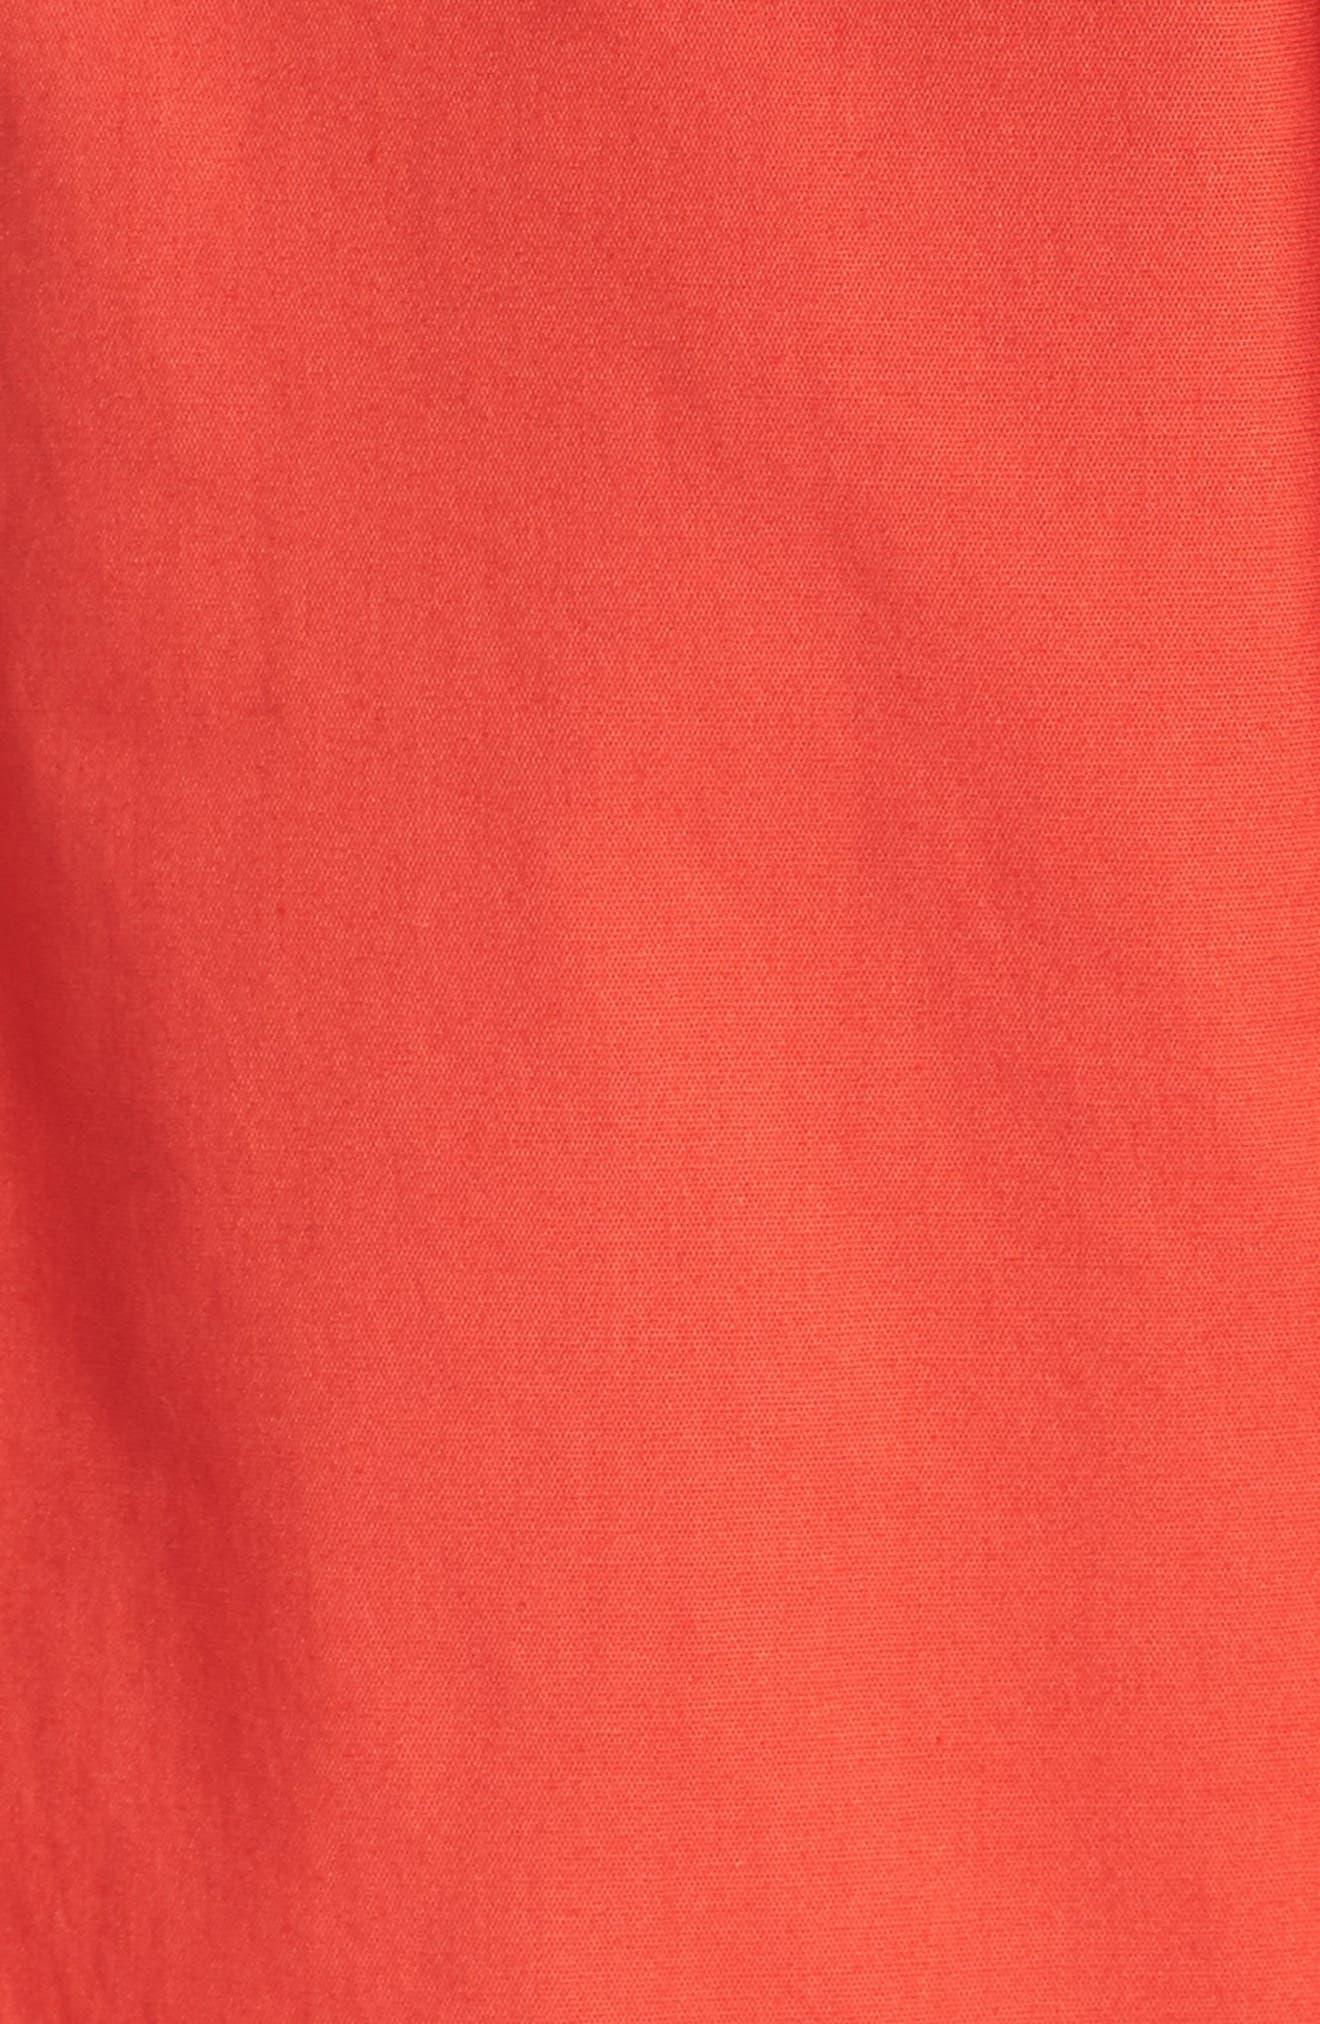 Ruffle Trim Poplin Wrap Dress,                             Alternate thumbnail 6, color,                             Coral